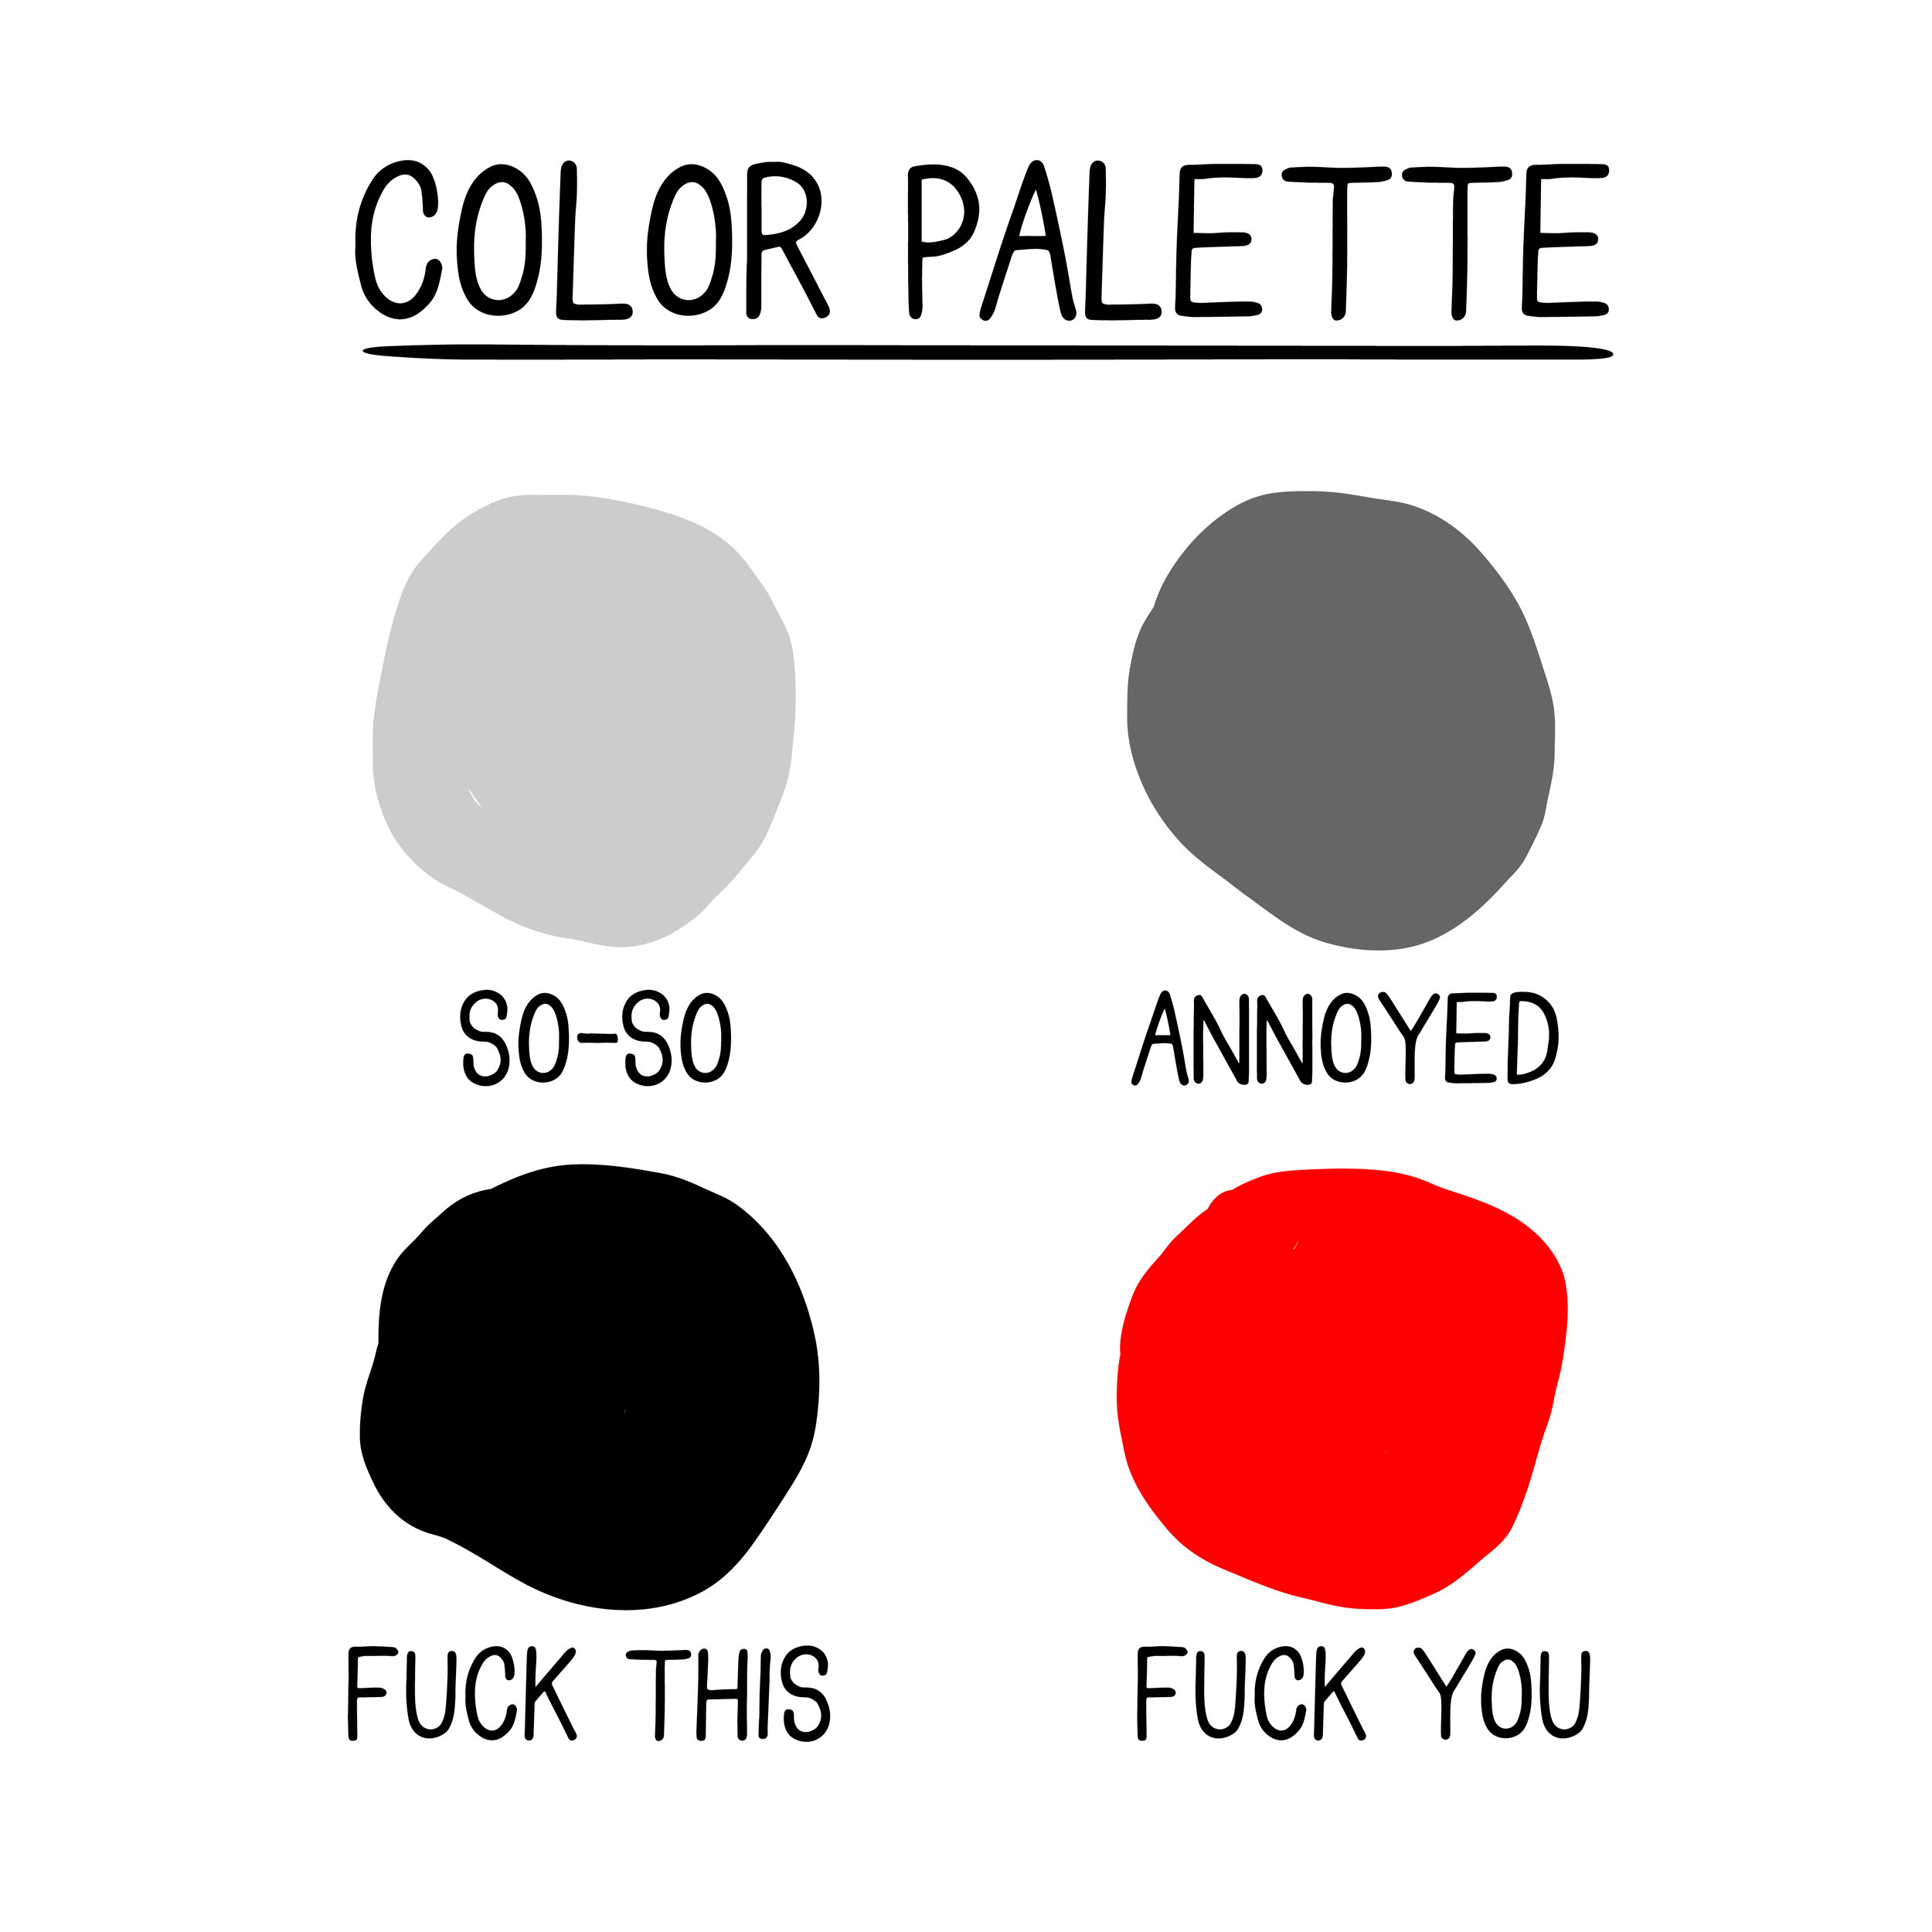 colorpalette-01.jpg